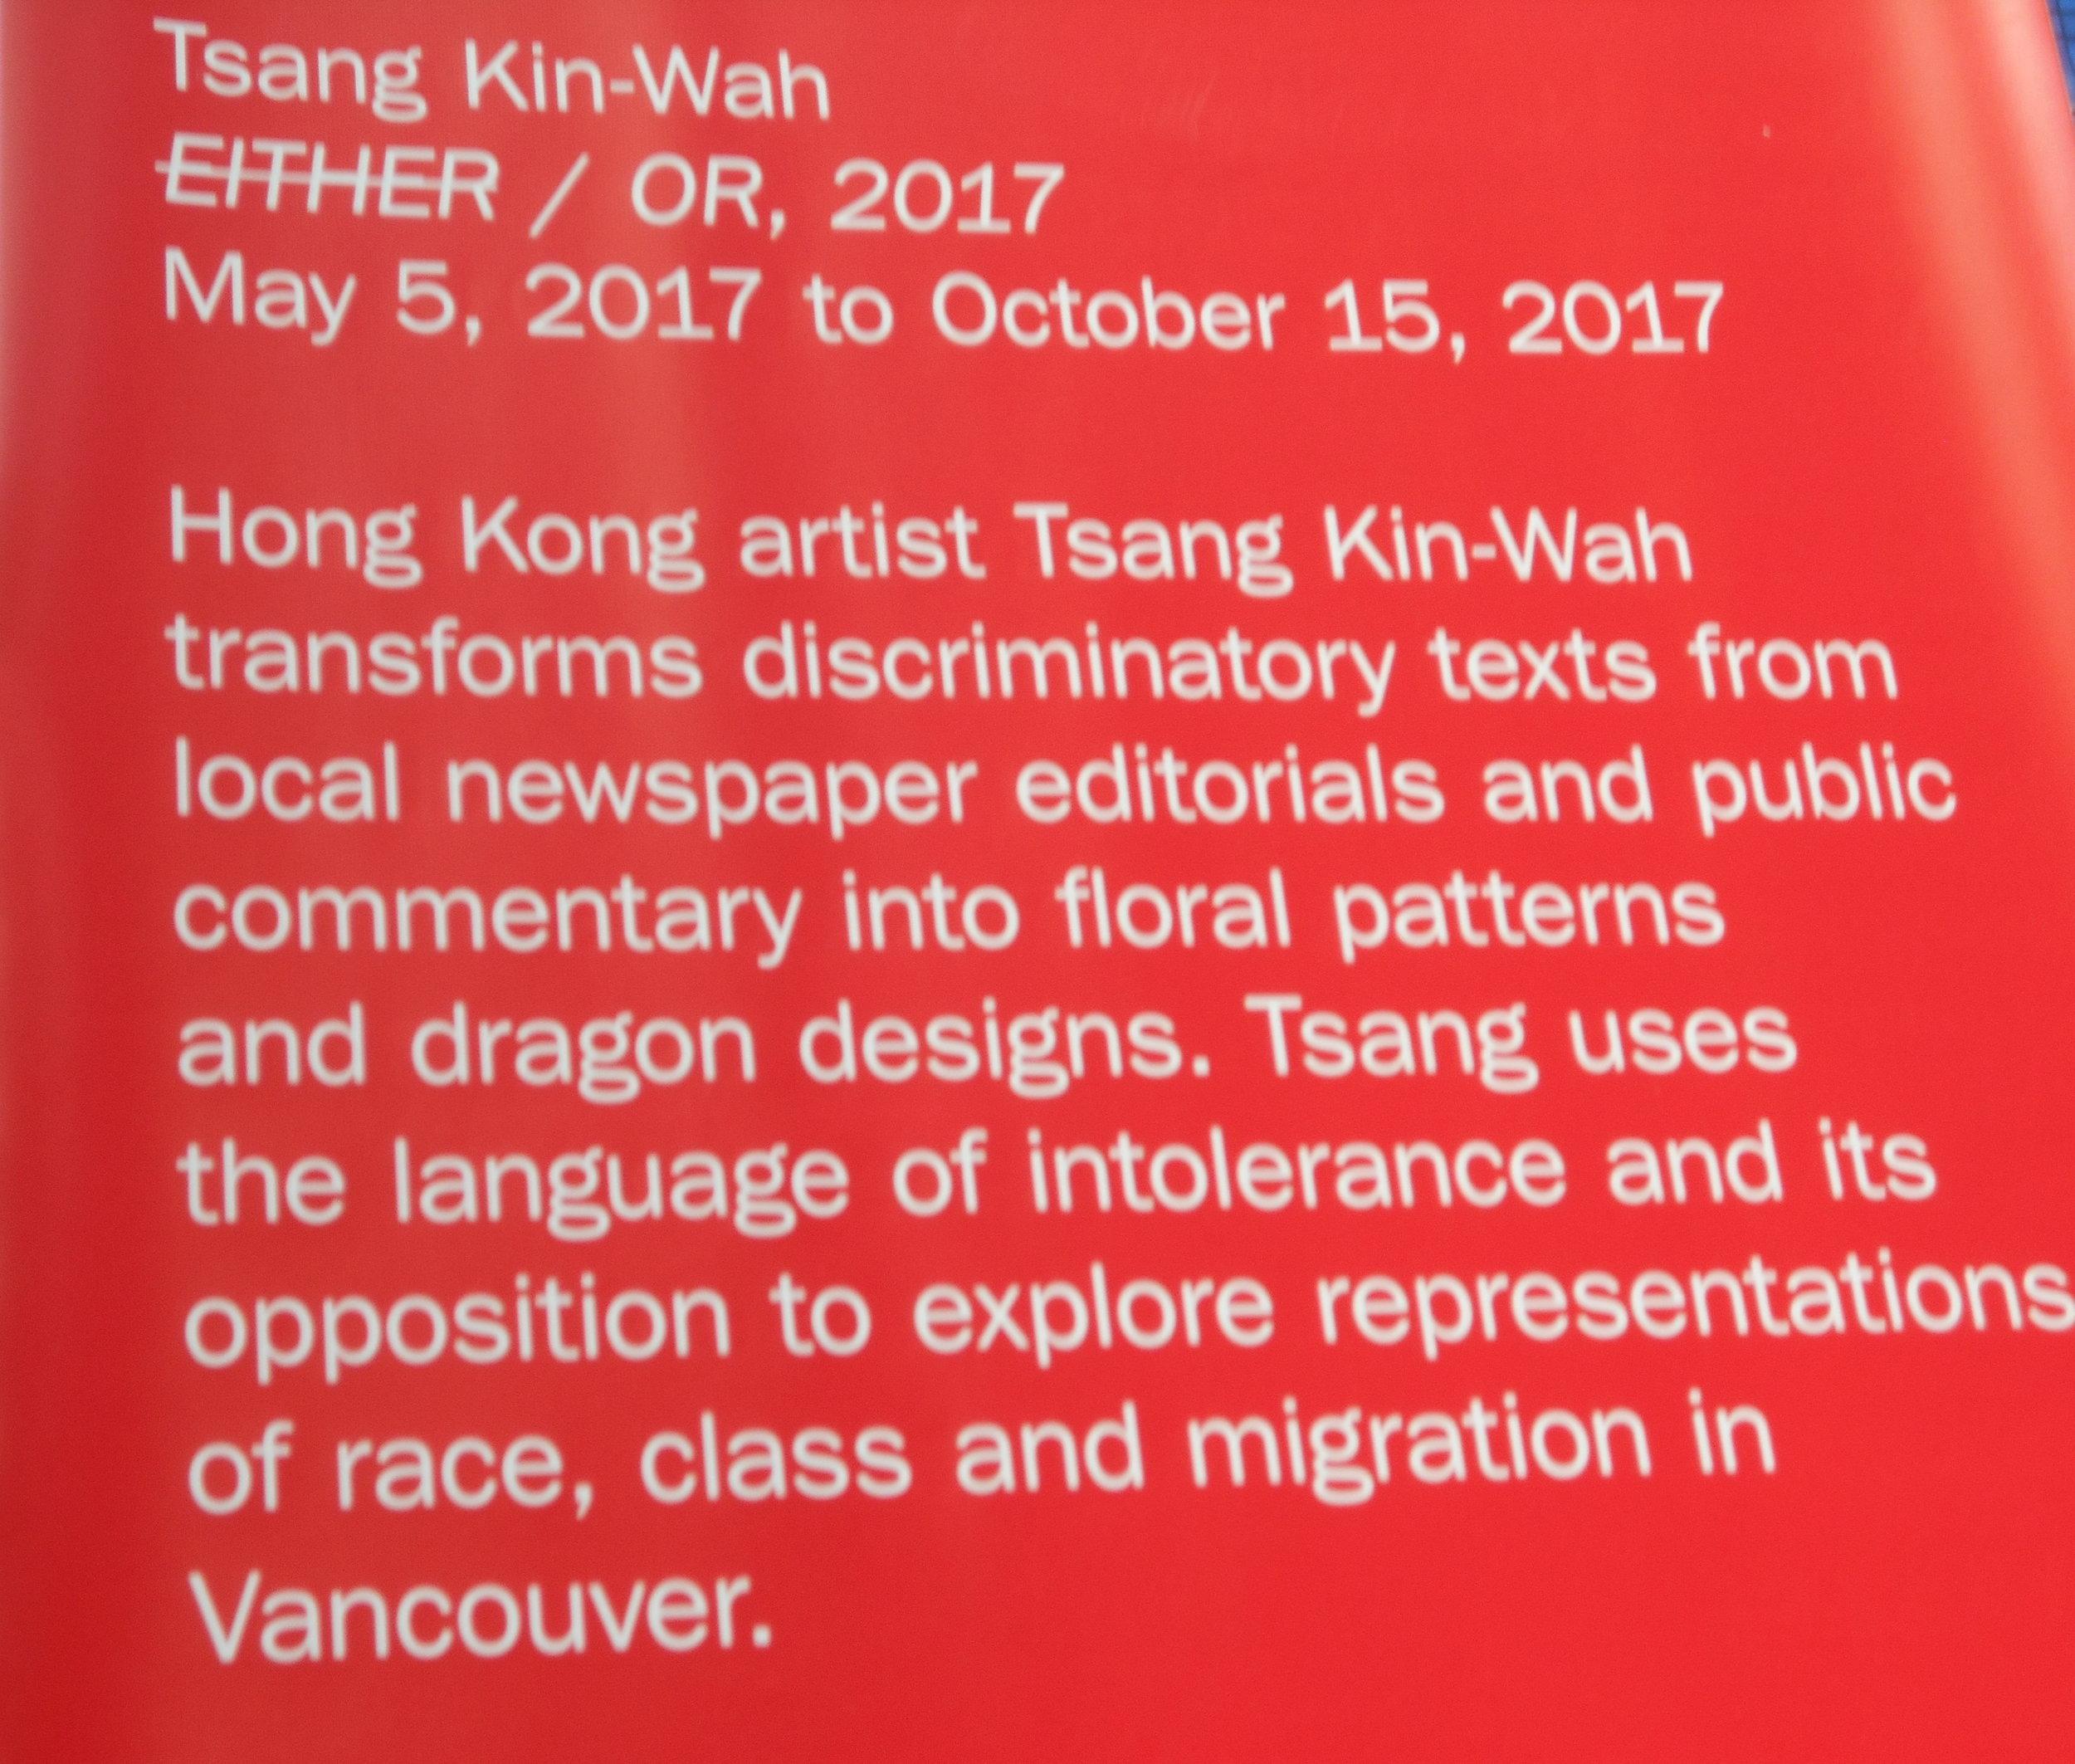 Descriptive plaque explains the theme of the installation.